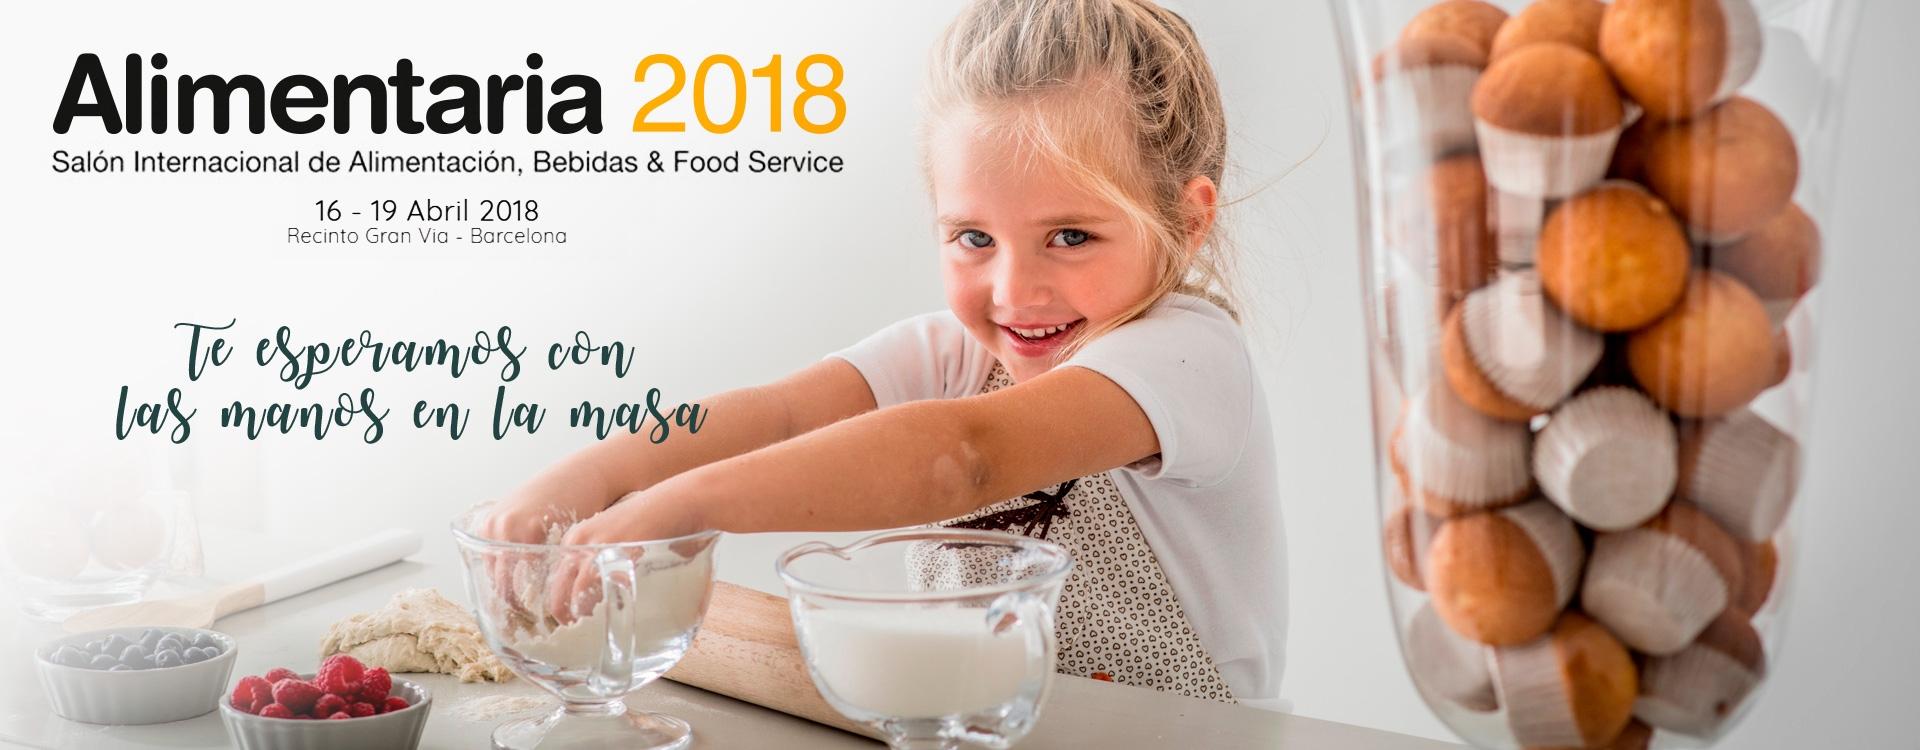 Menal en Alimentaria 2018